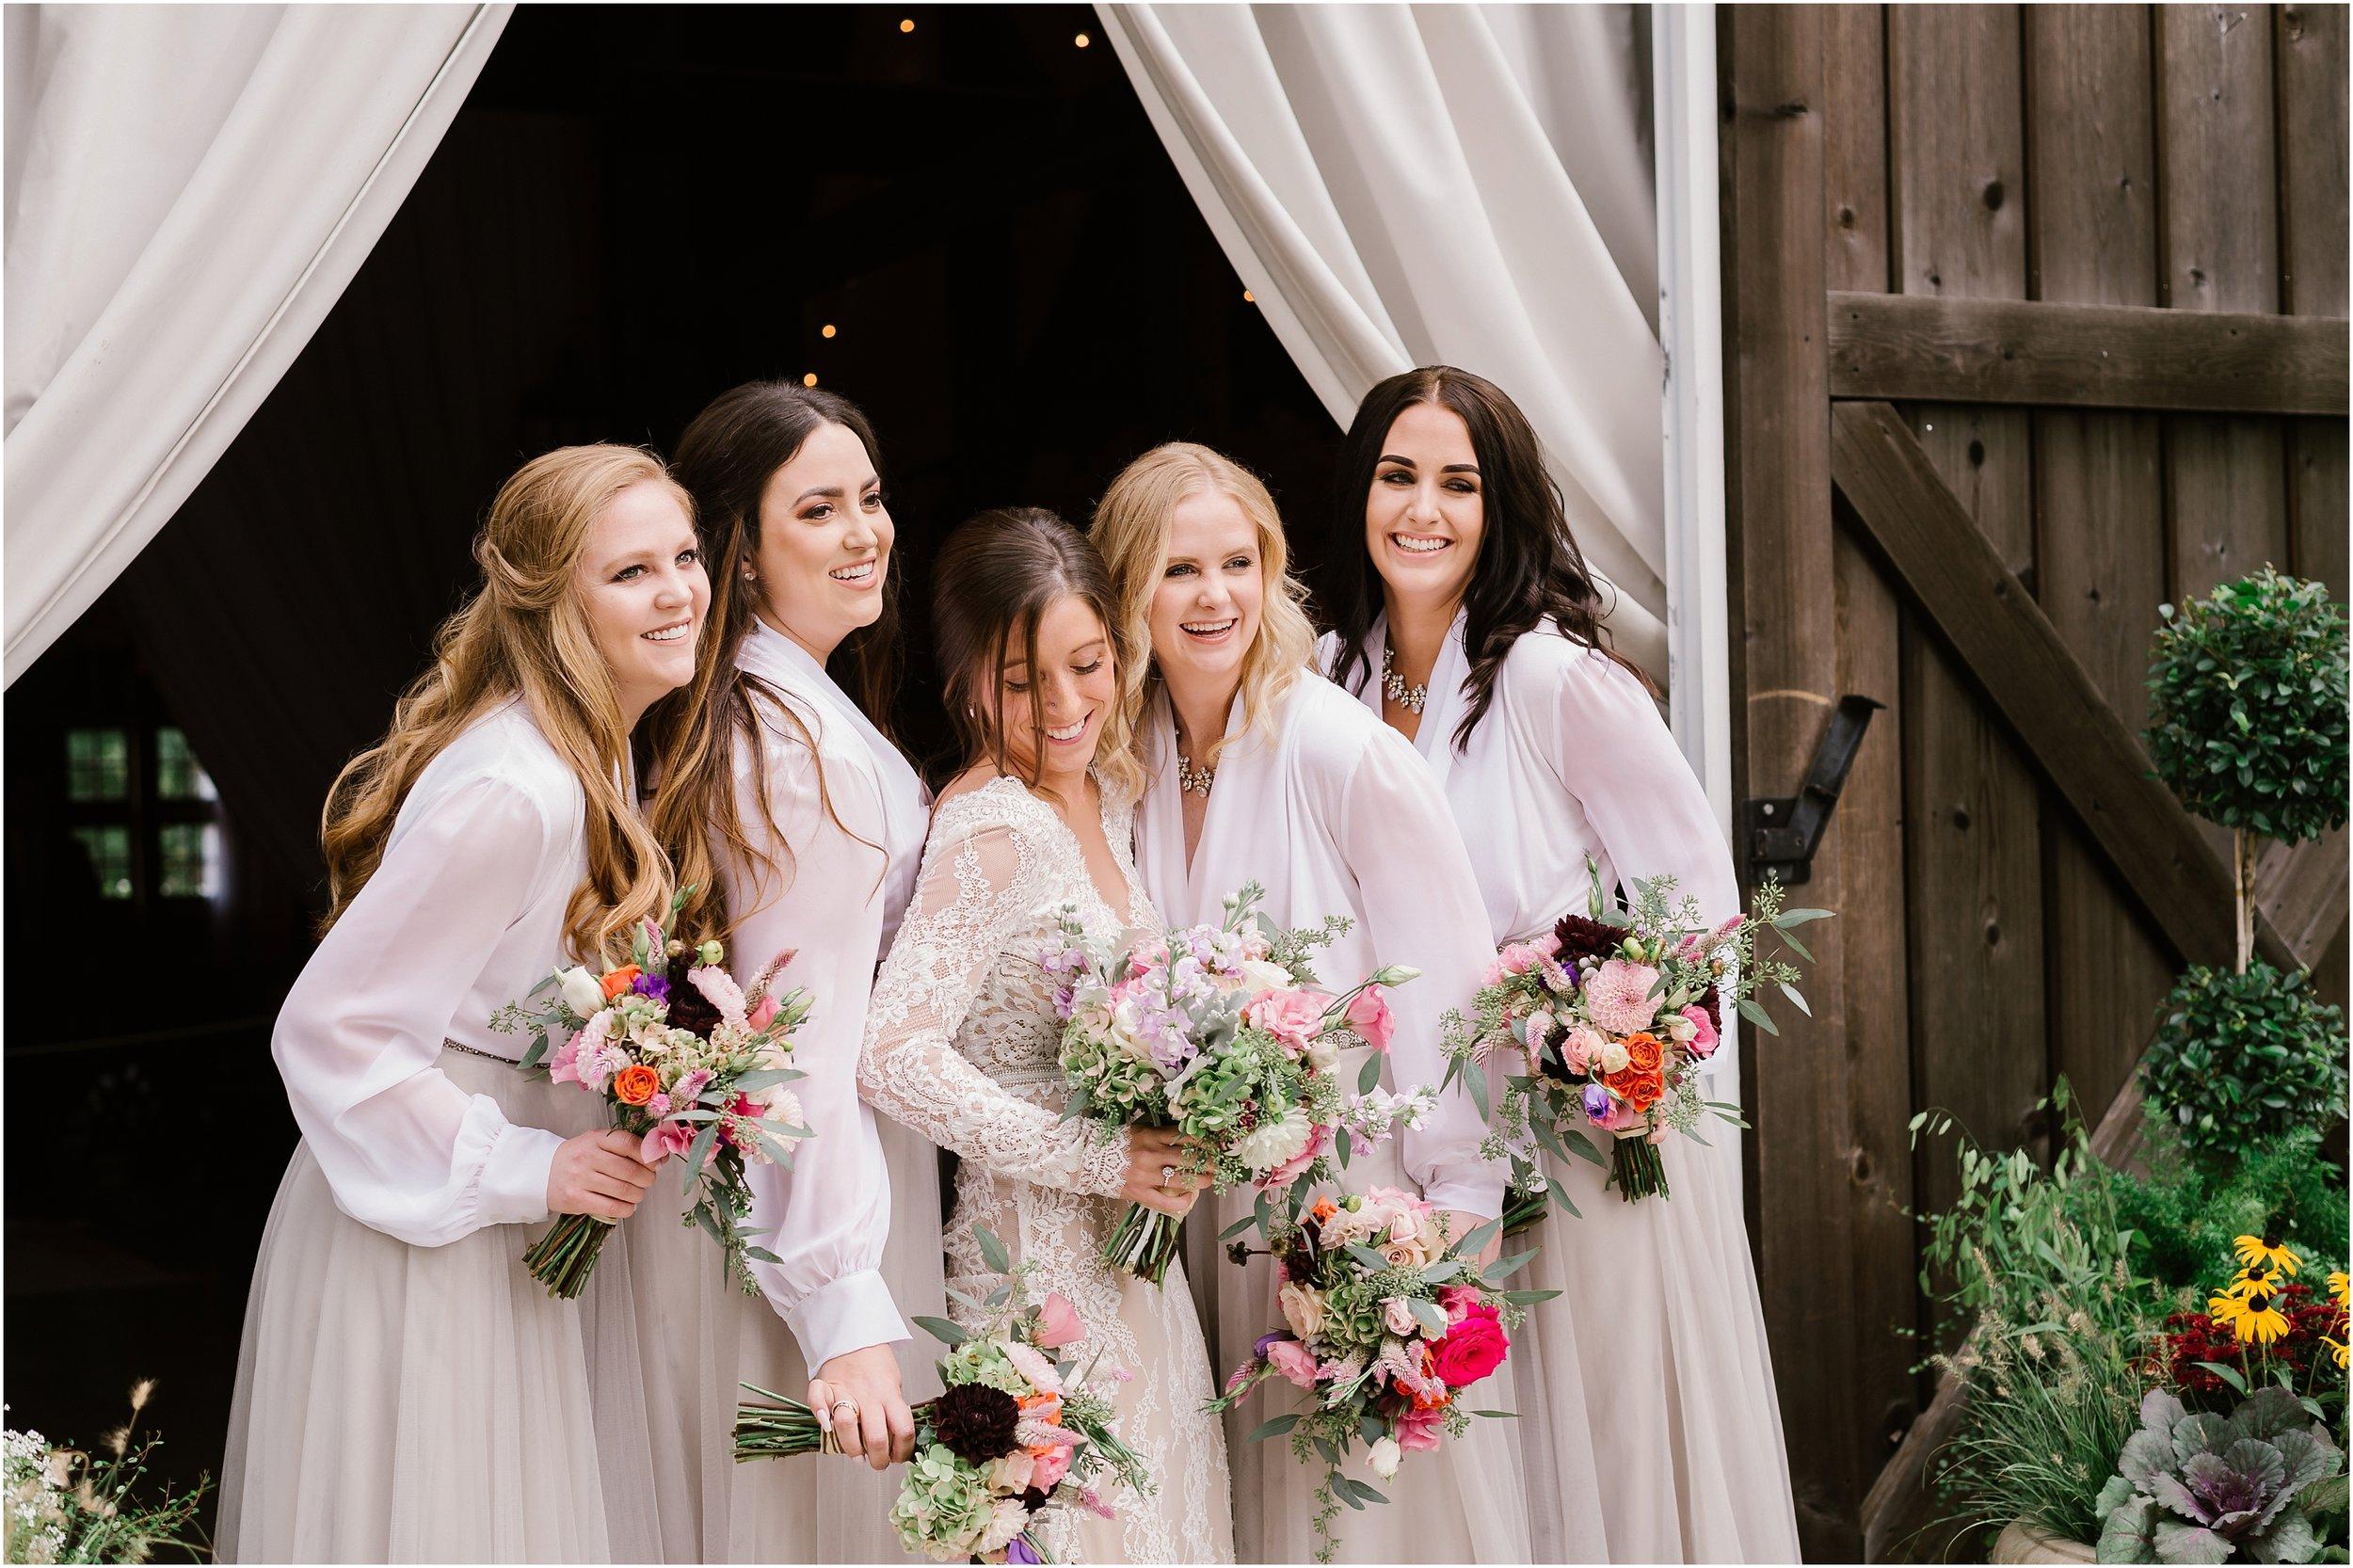 Rebecca_Shehorn_Photography_Indianapolis_Wedding_Photographer_9256.jpg